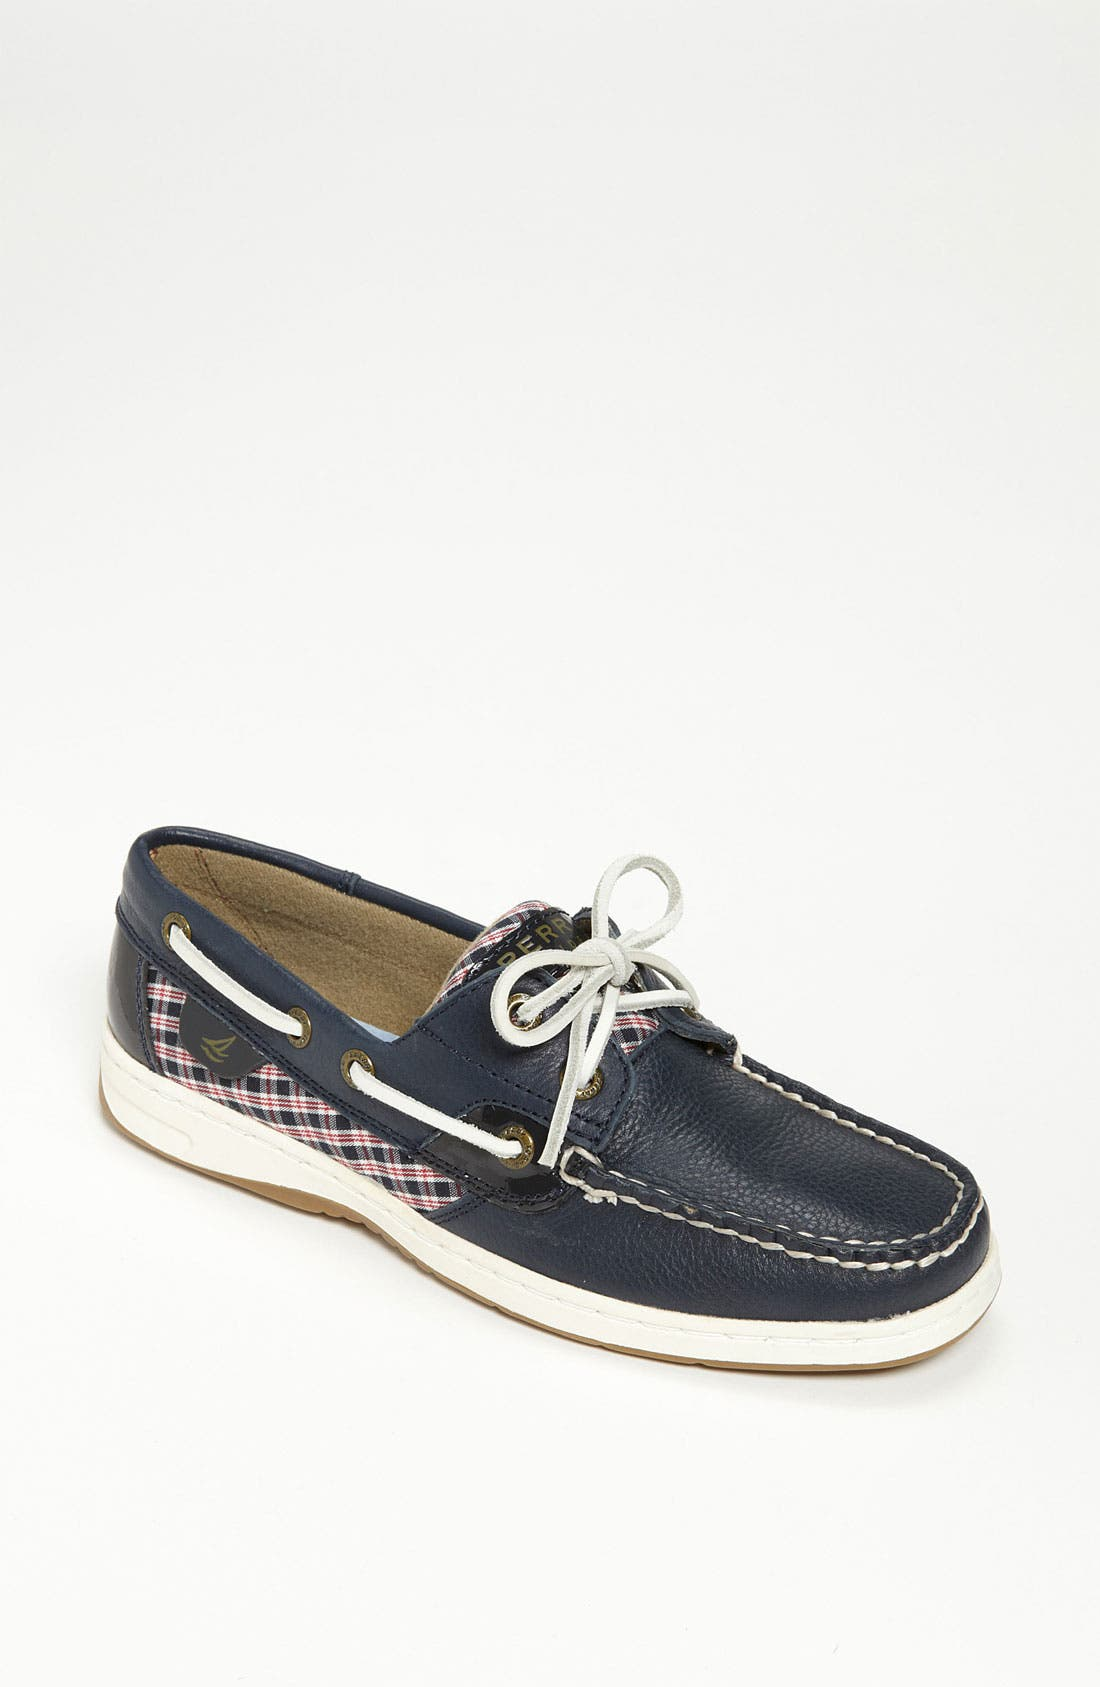 Main Image - Sperry 'Bluefish 2-Eye' Boat Shoe (Women)